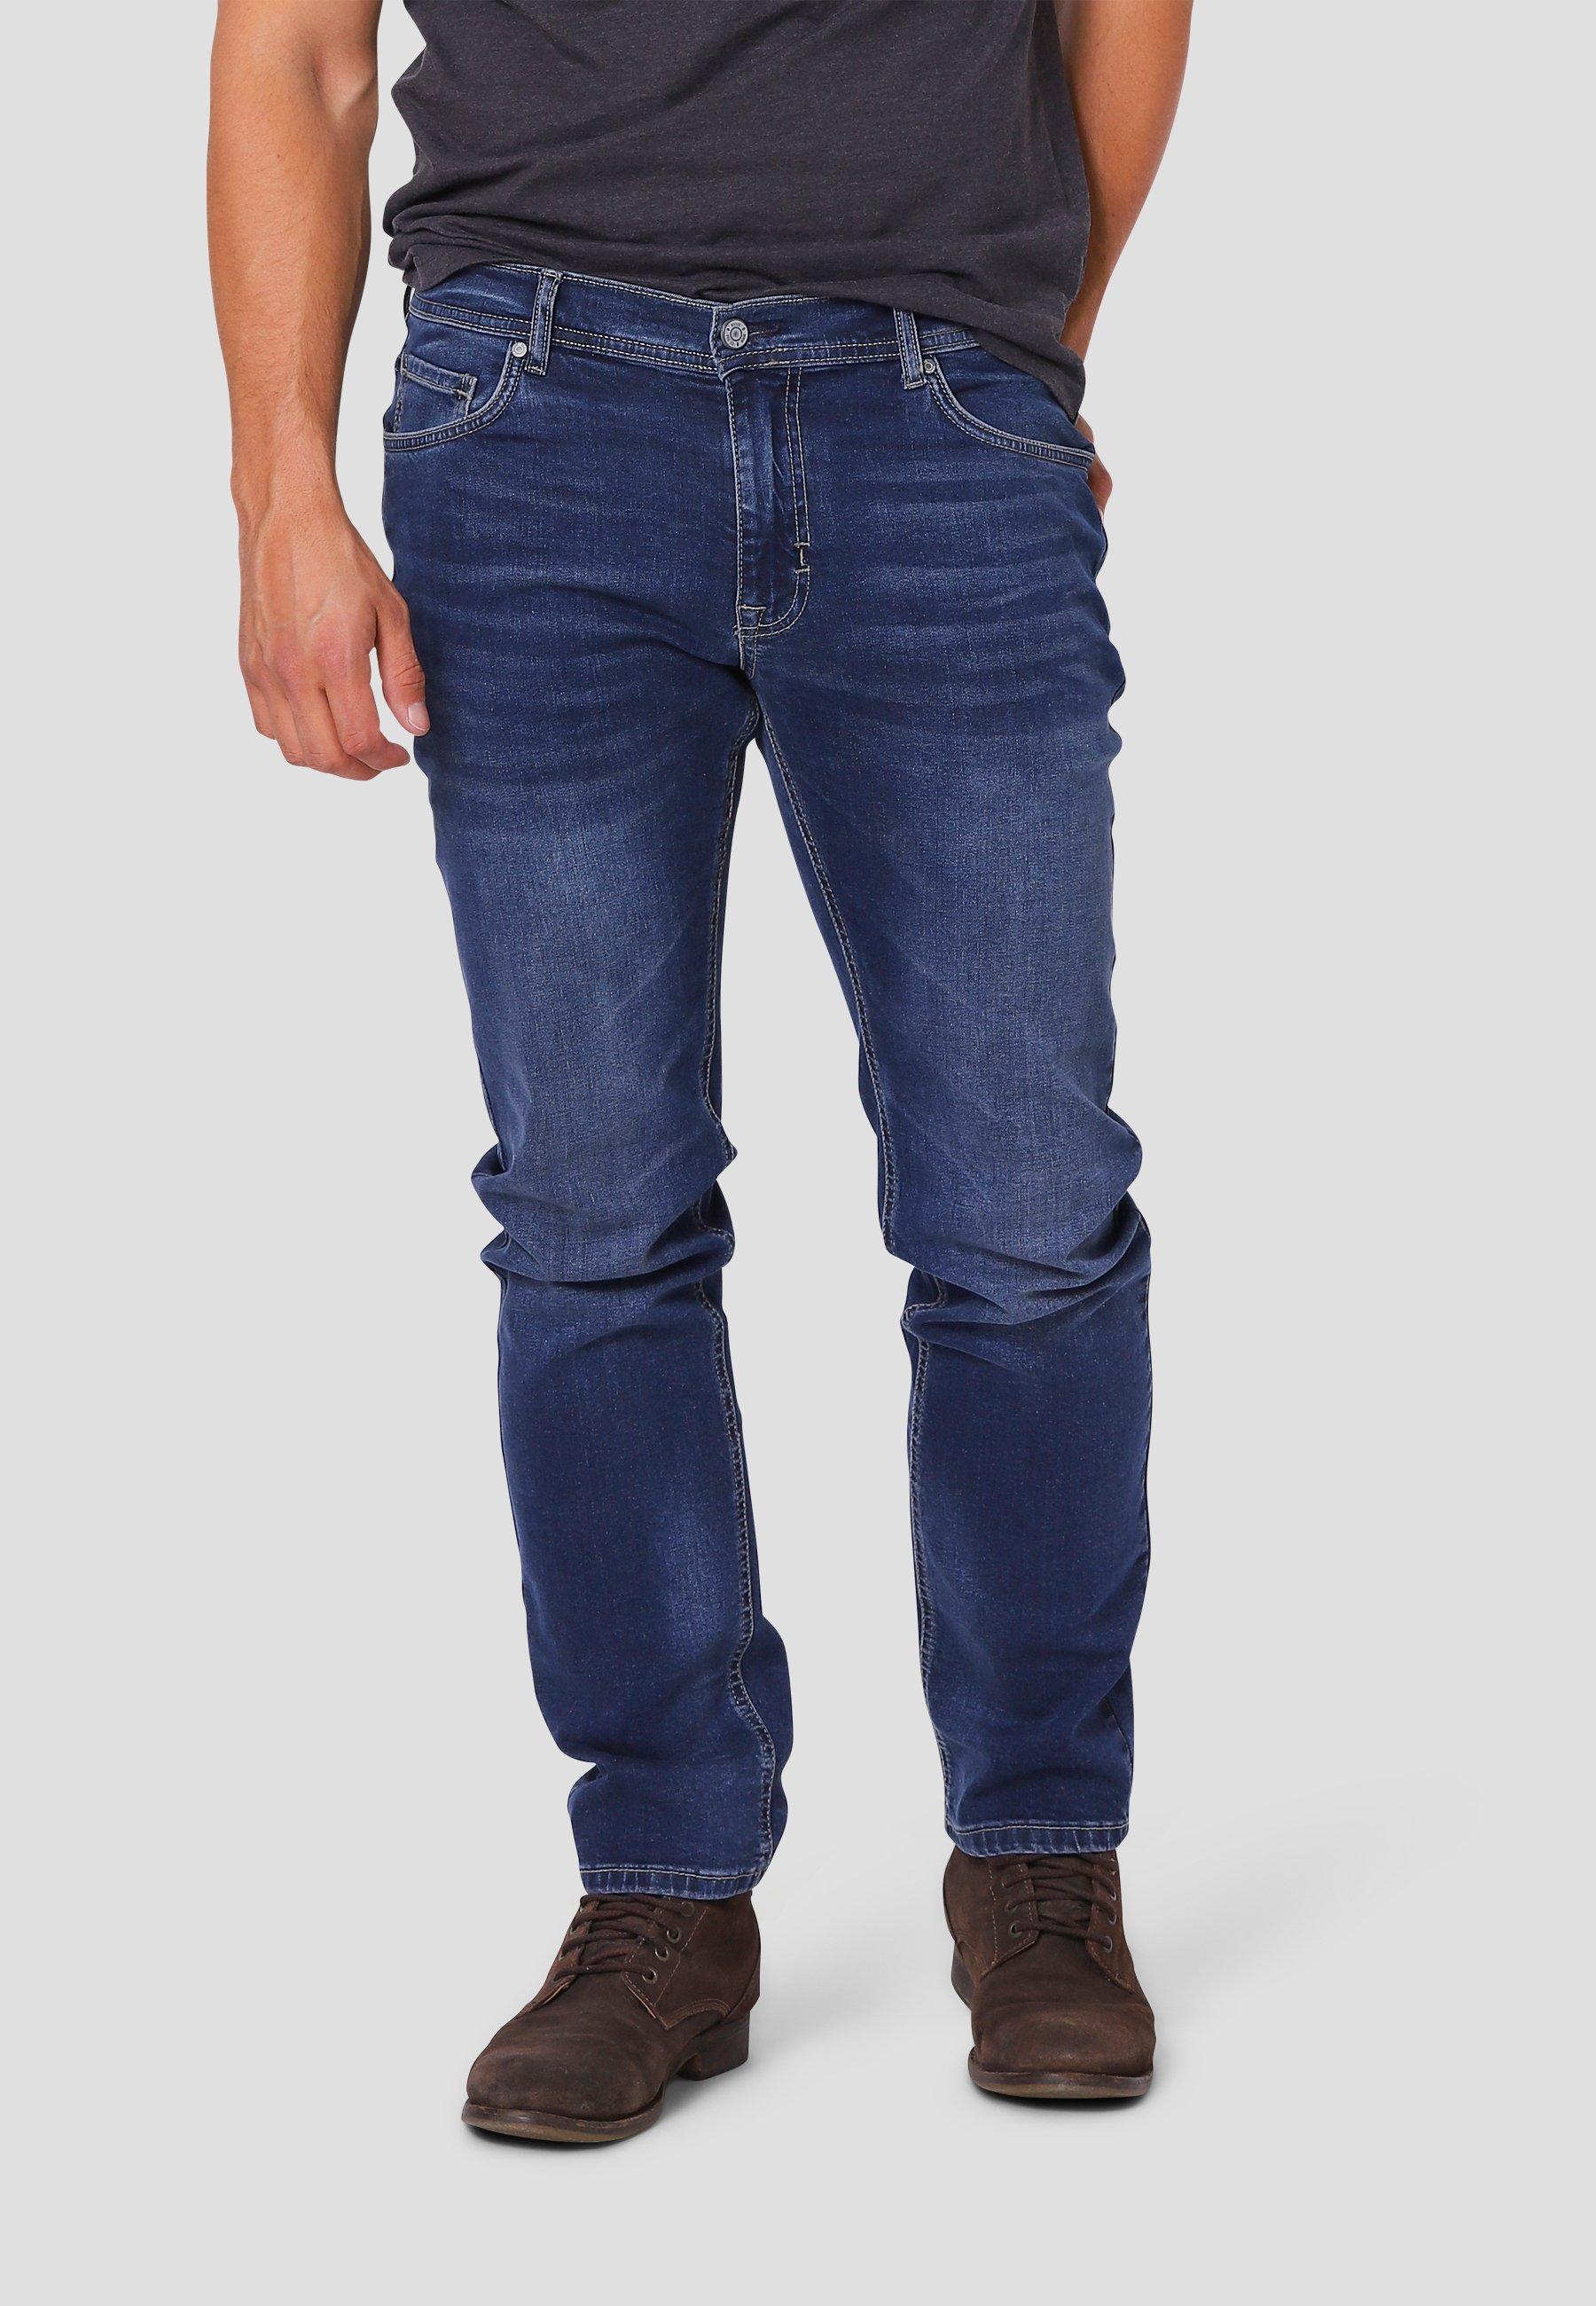 Uomo FELIX - Jeans slim fit